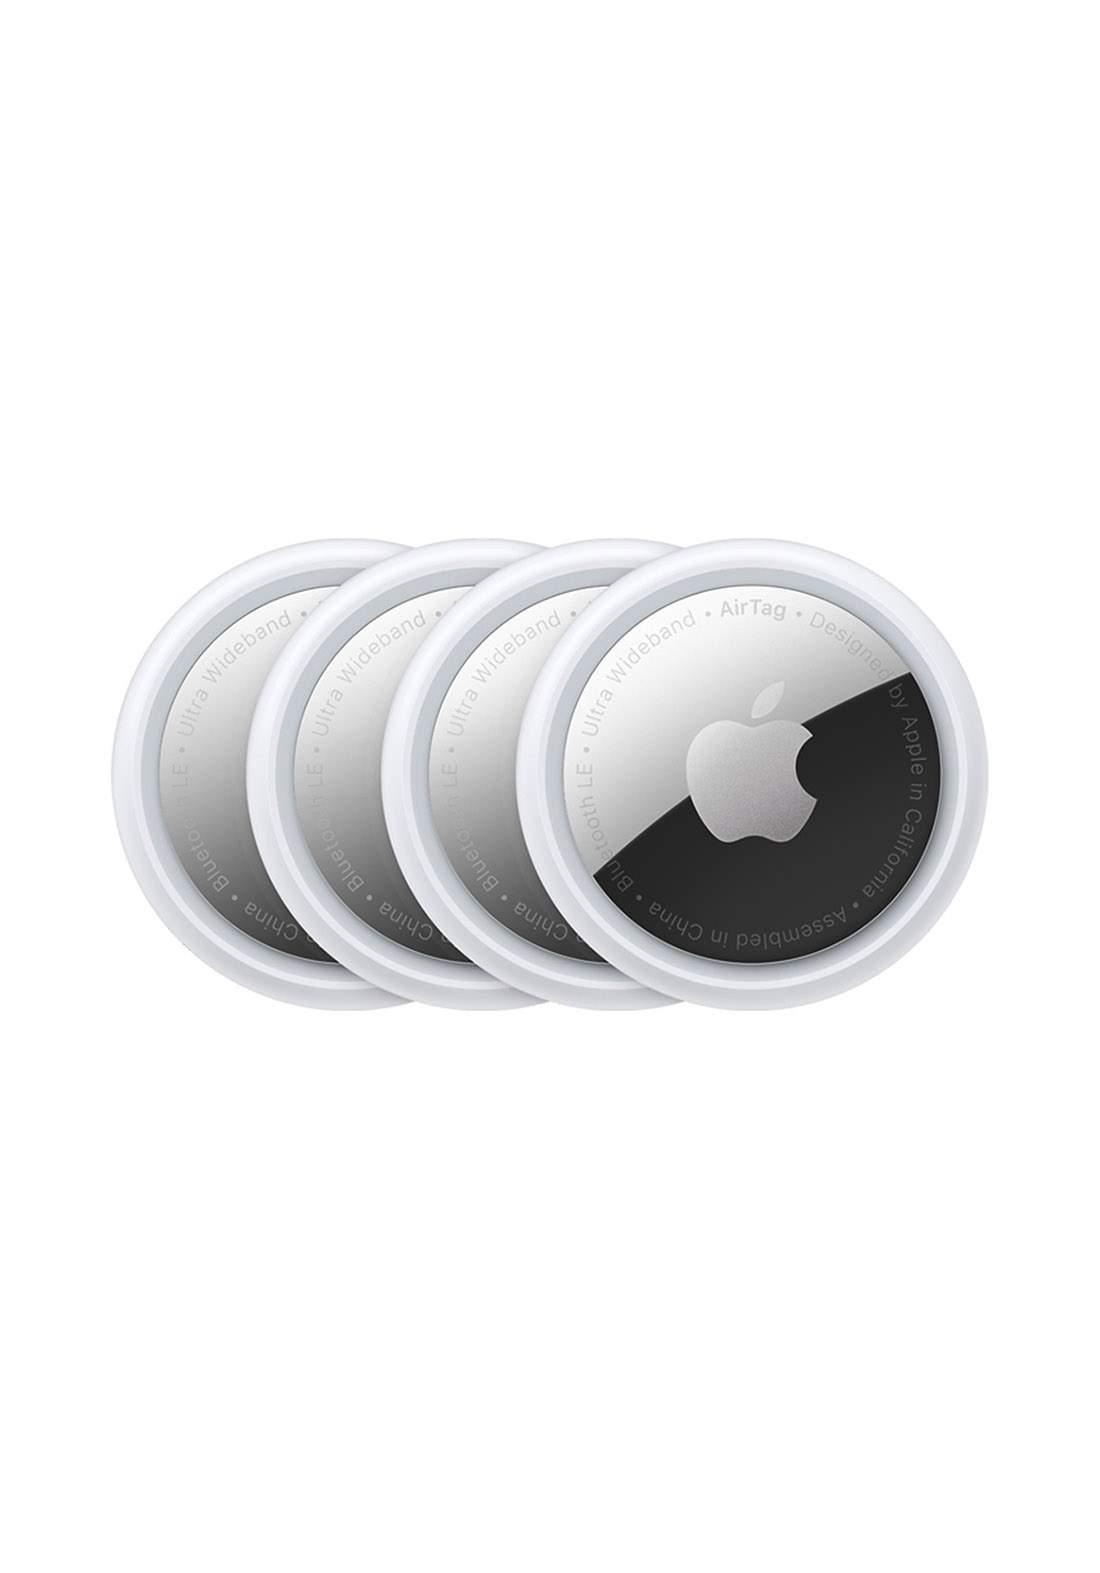 Apple AirTag 4 Pack - White